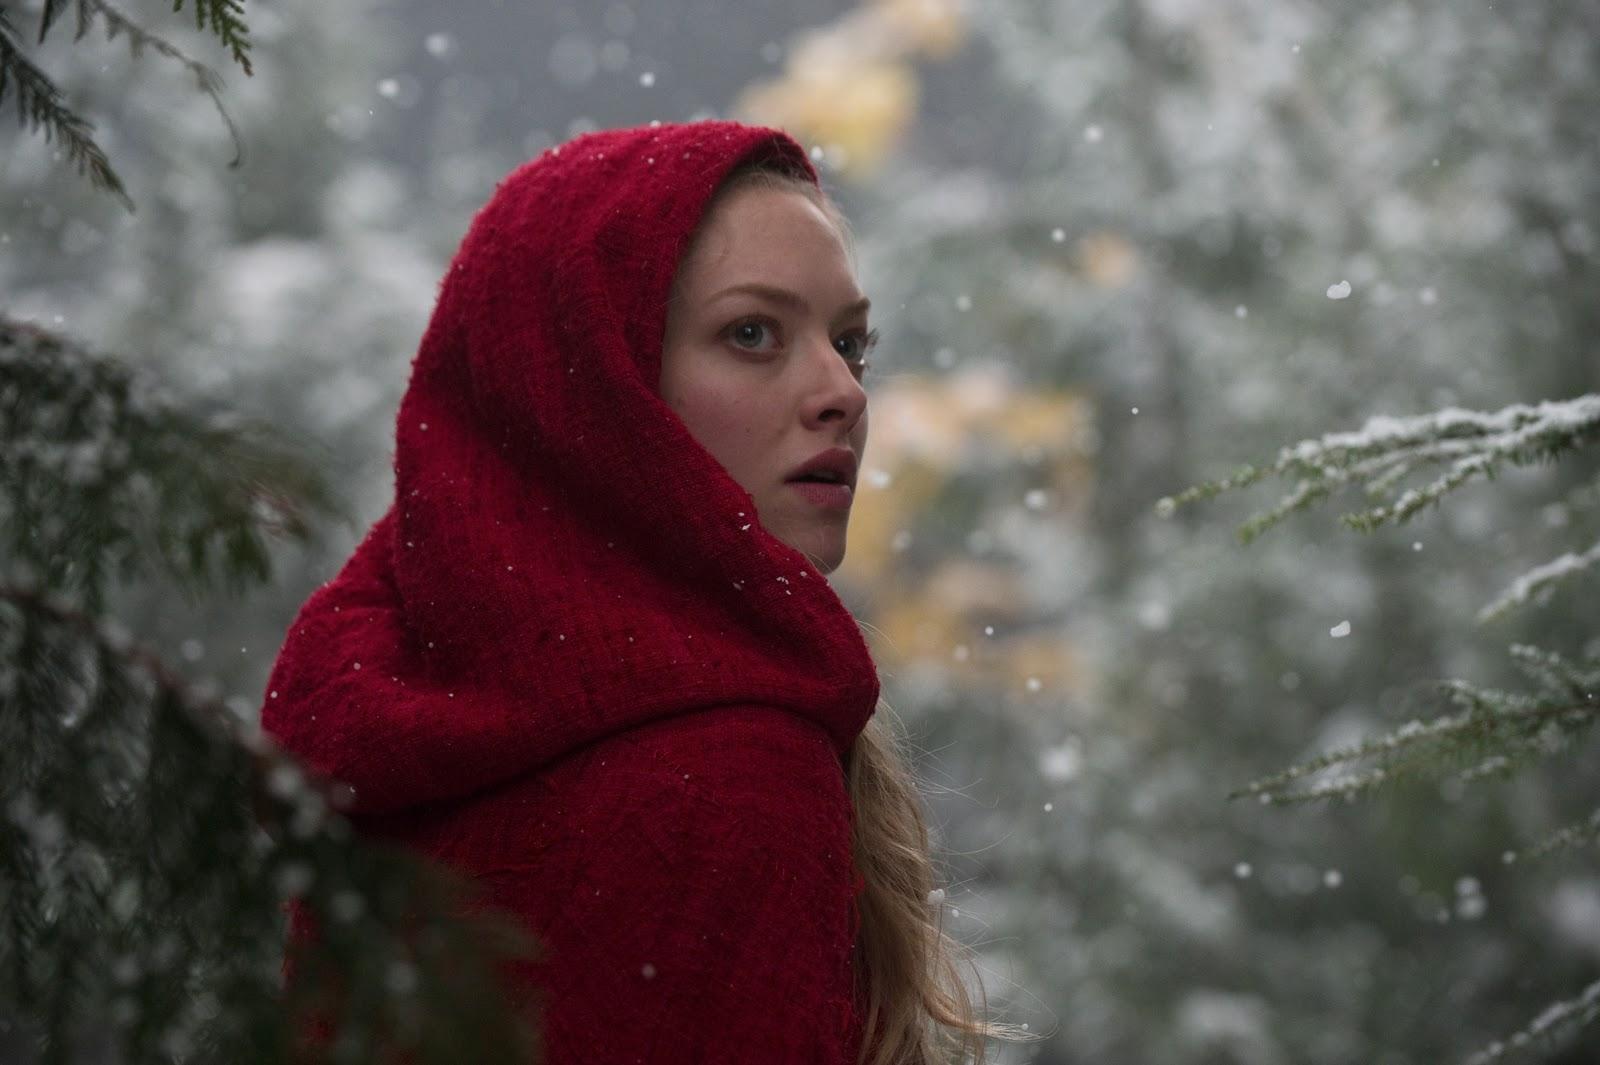 http://1.bp.blogspot.com/_203N03RKSAs/TTQYd5K5z4I/AAAAAAAAA4s/nT_JdQkUxFU/s1600/red_riding_hood_movie_image_amanda_seyfried_02.jpg